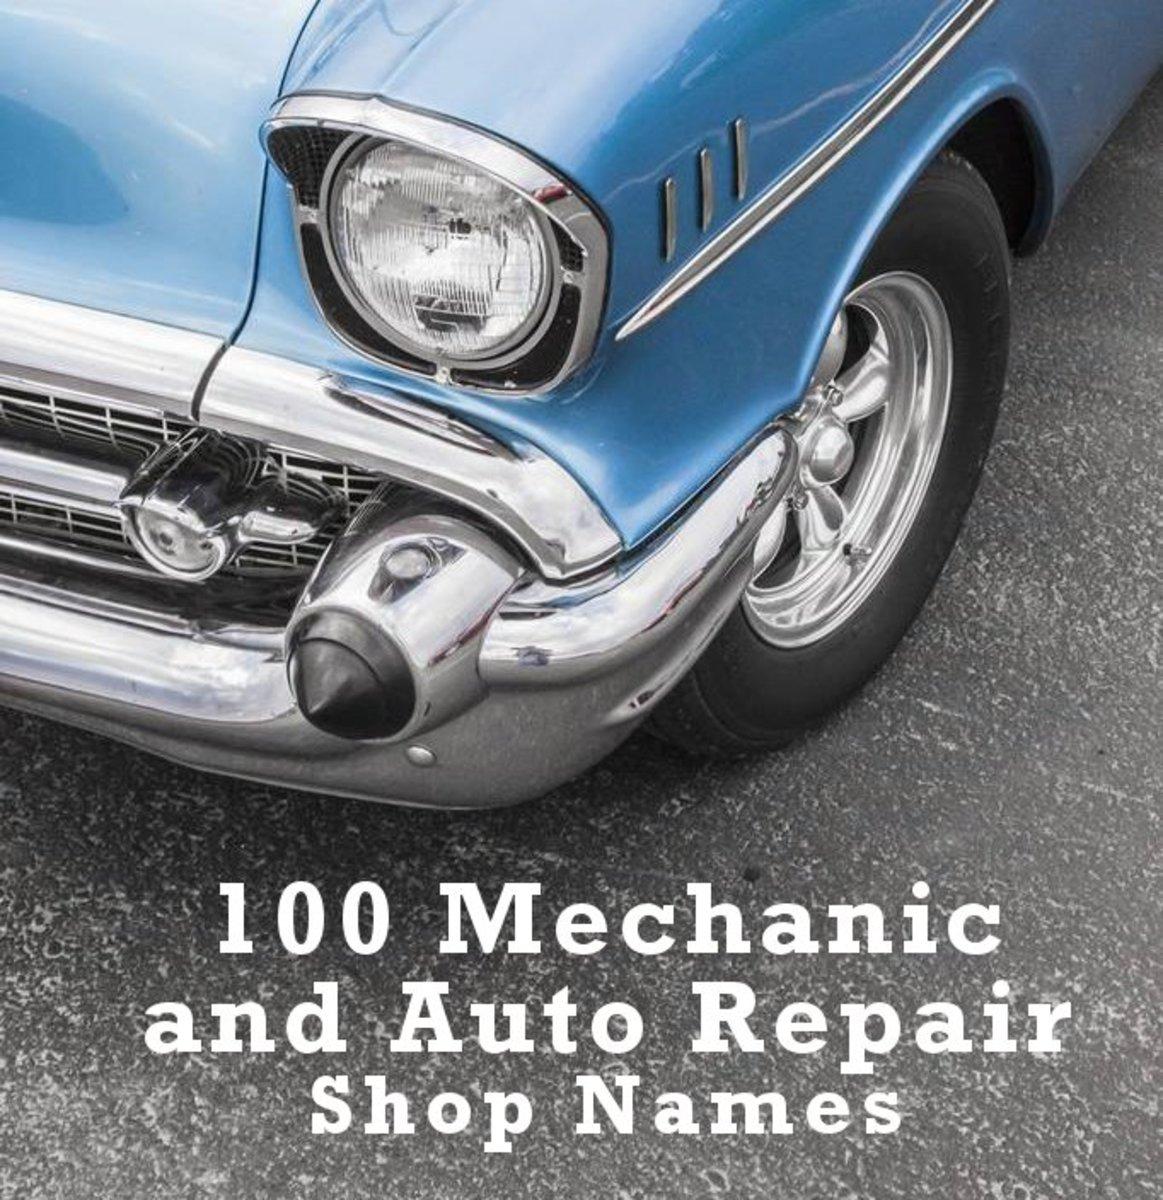 100 Mechanic and Auto Repair Shop Names ToughNickel